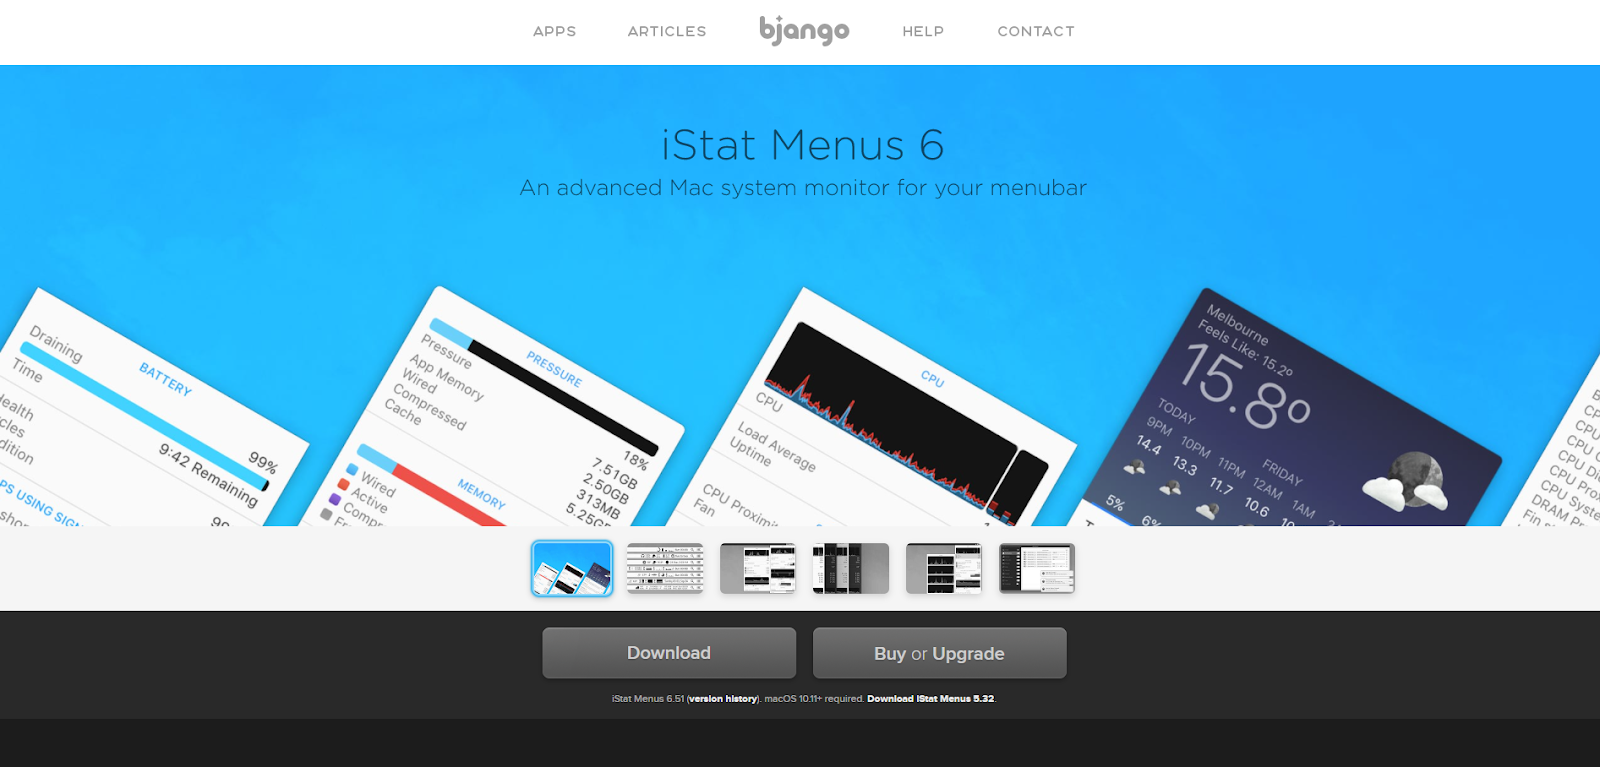 Mac Network Monitoring Software - iStat Menus